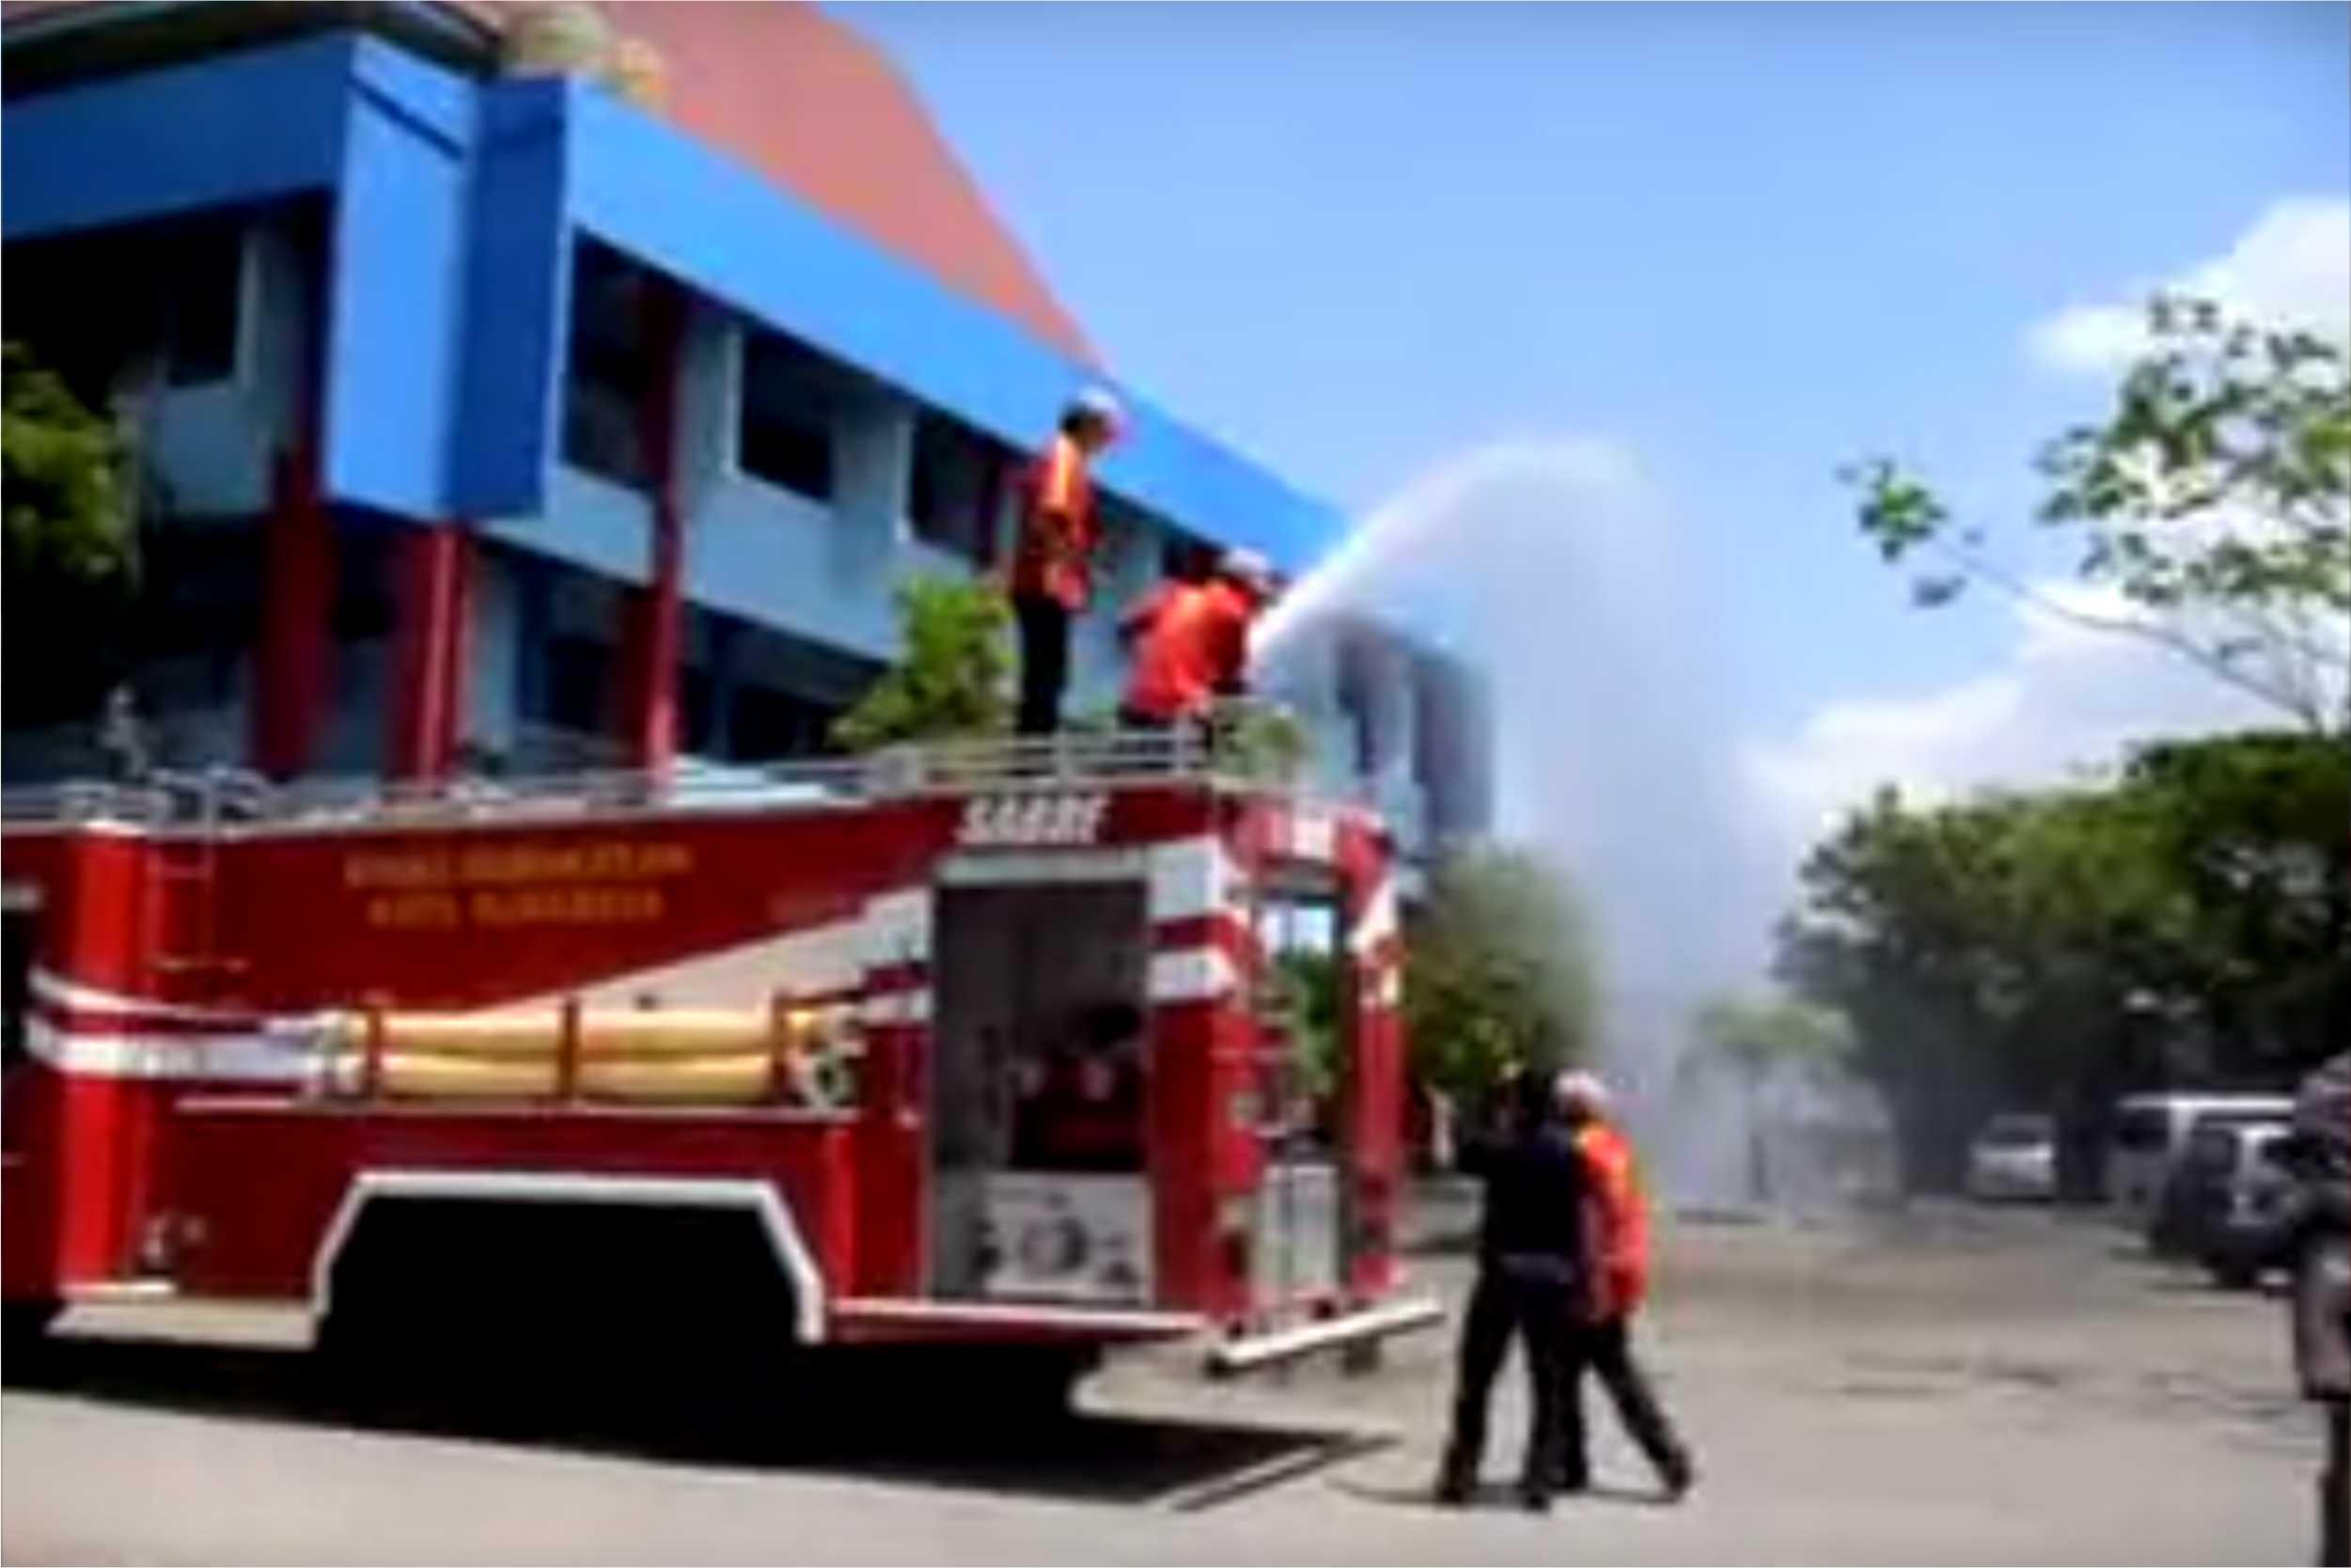 Firetruck Saberindo 300813